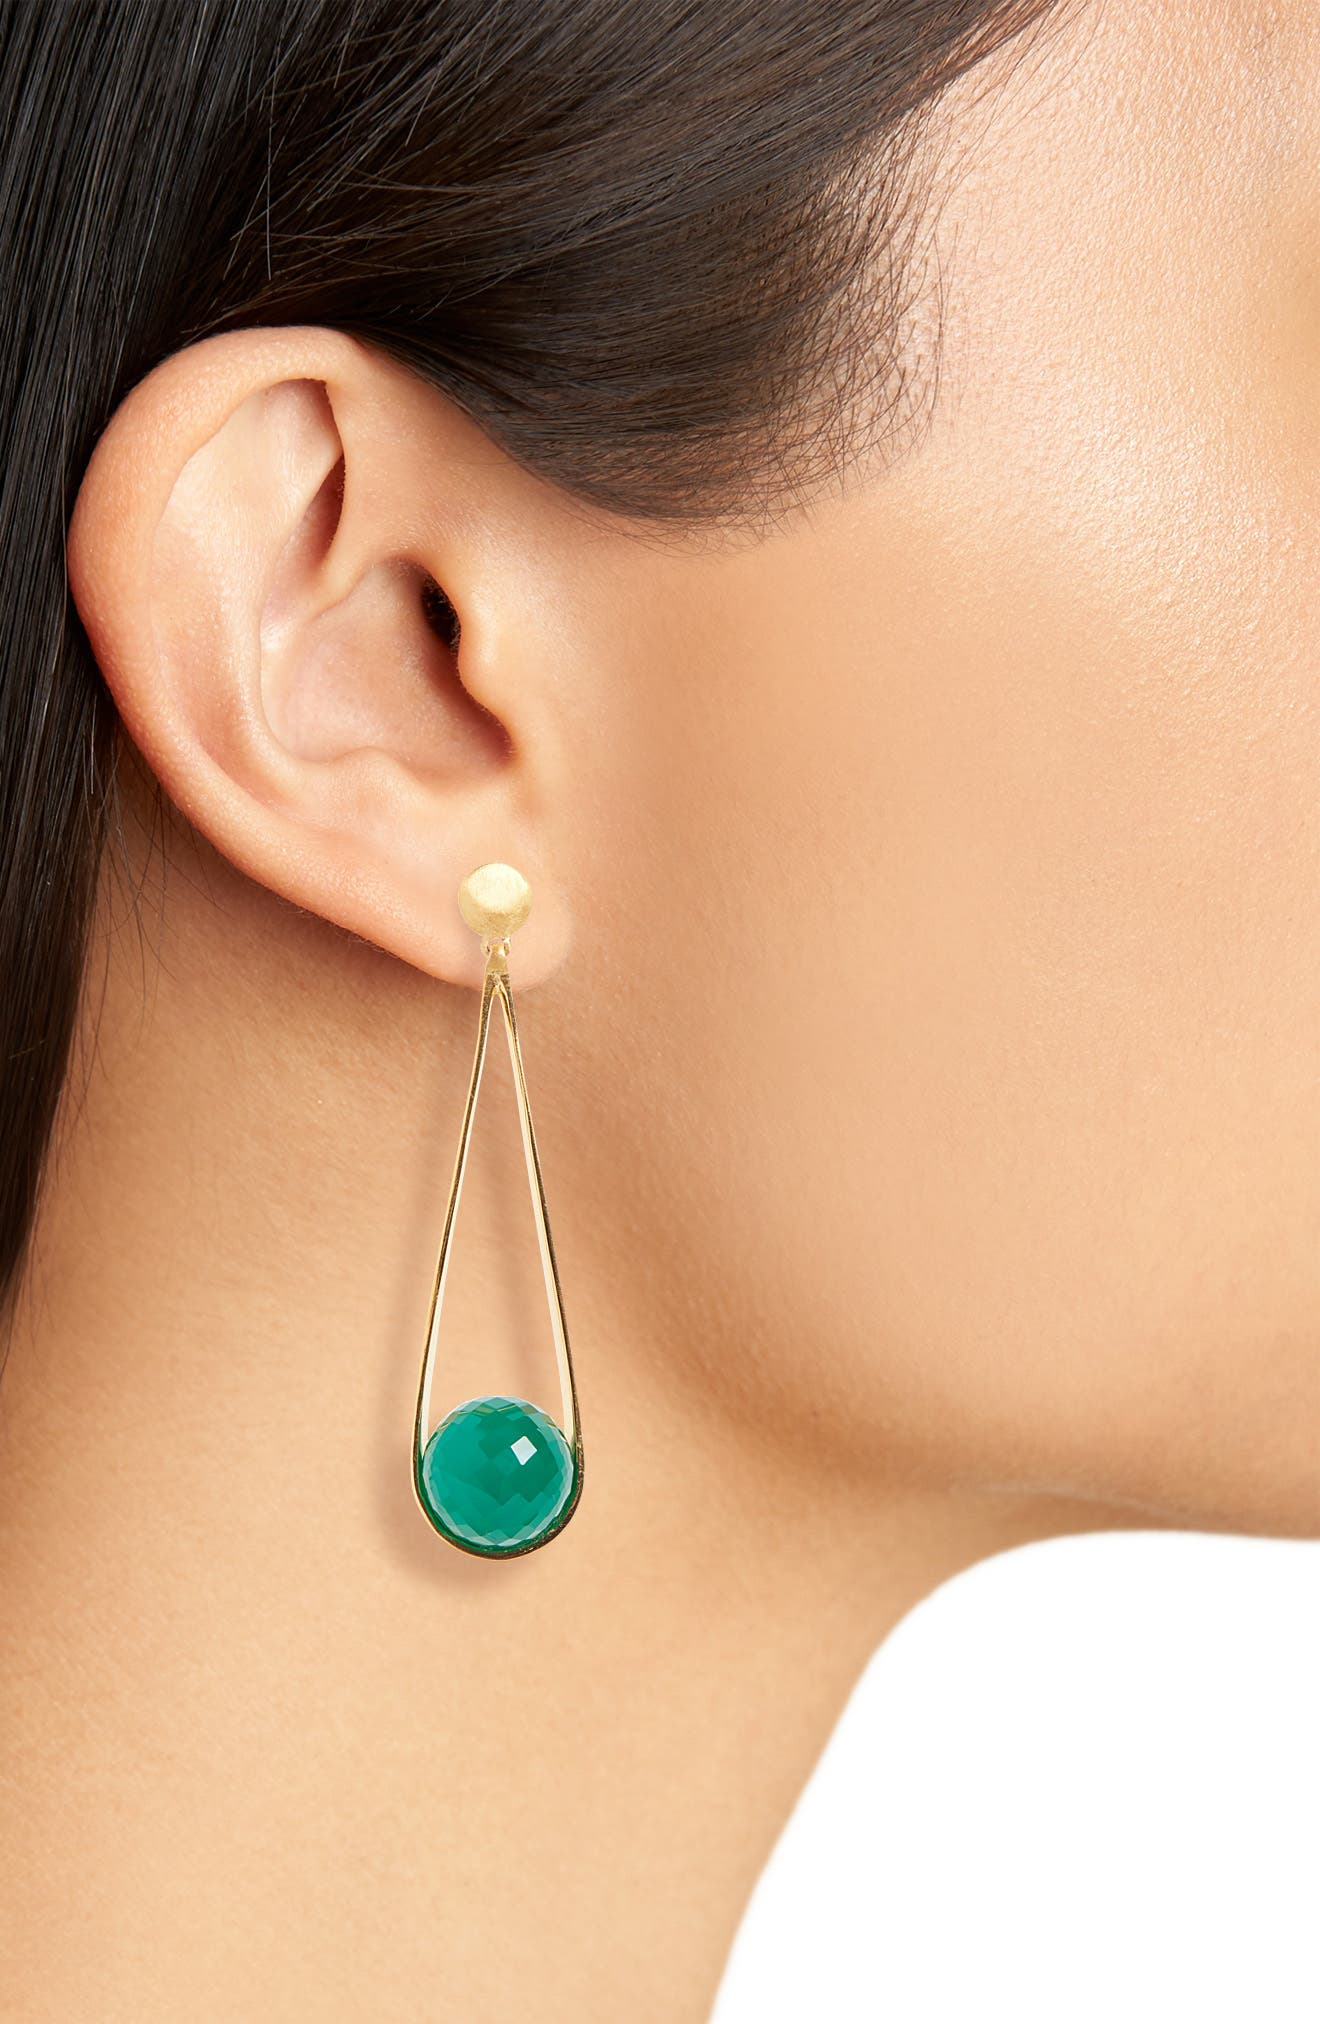 Ipanema Earrings,                             Alternate thumbnail 2, color,                             GREEN ONYX/ GOLD